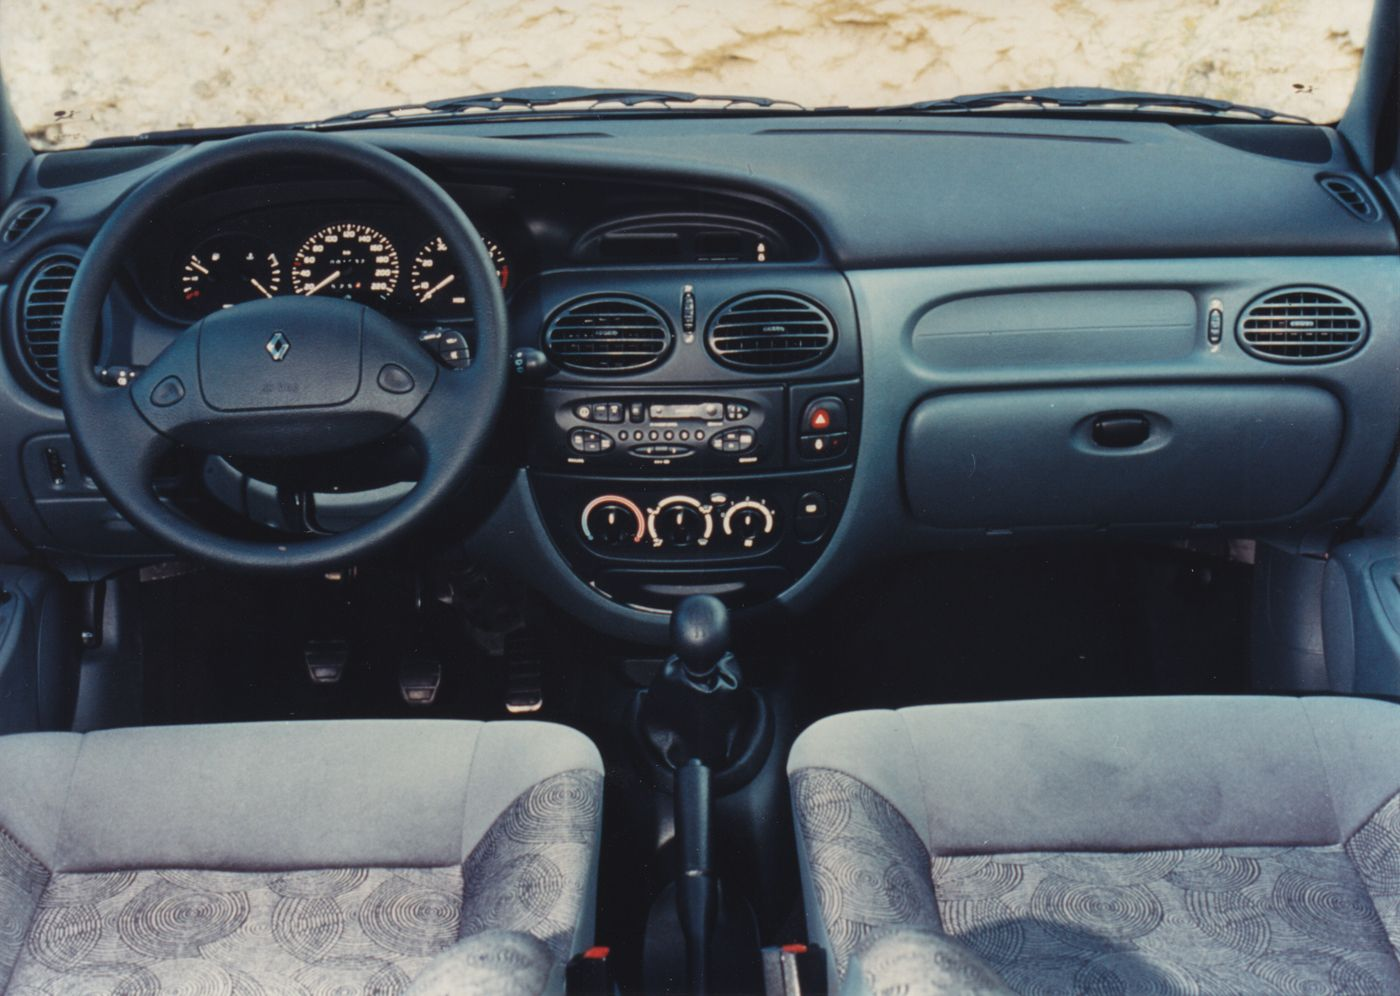 Renault Mégane dashboard (9-95)